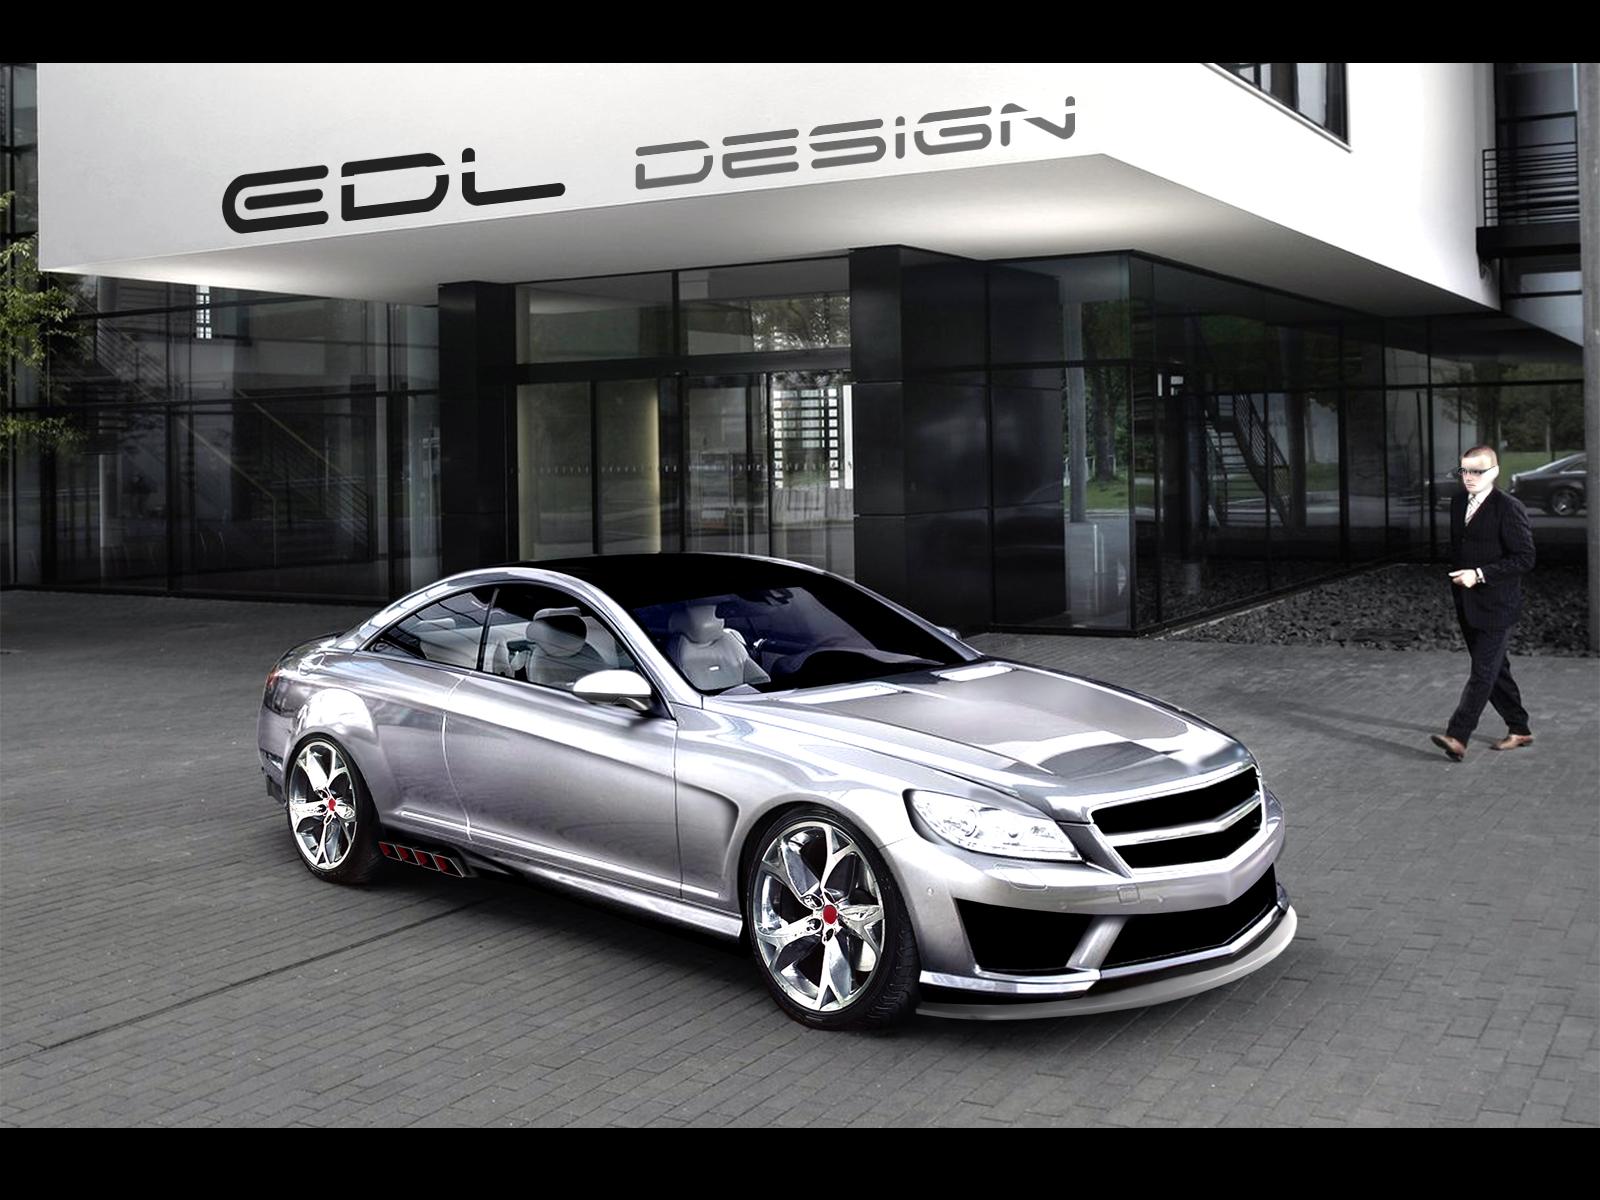 Edl design 39 s profile automotive design studio for Chrome mercedes benz